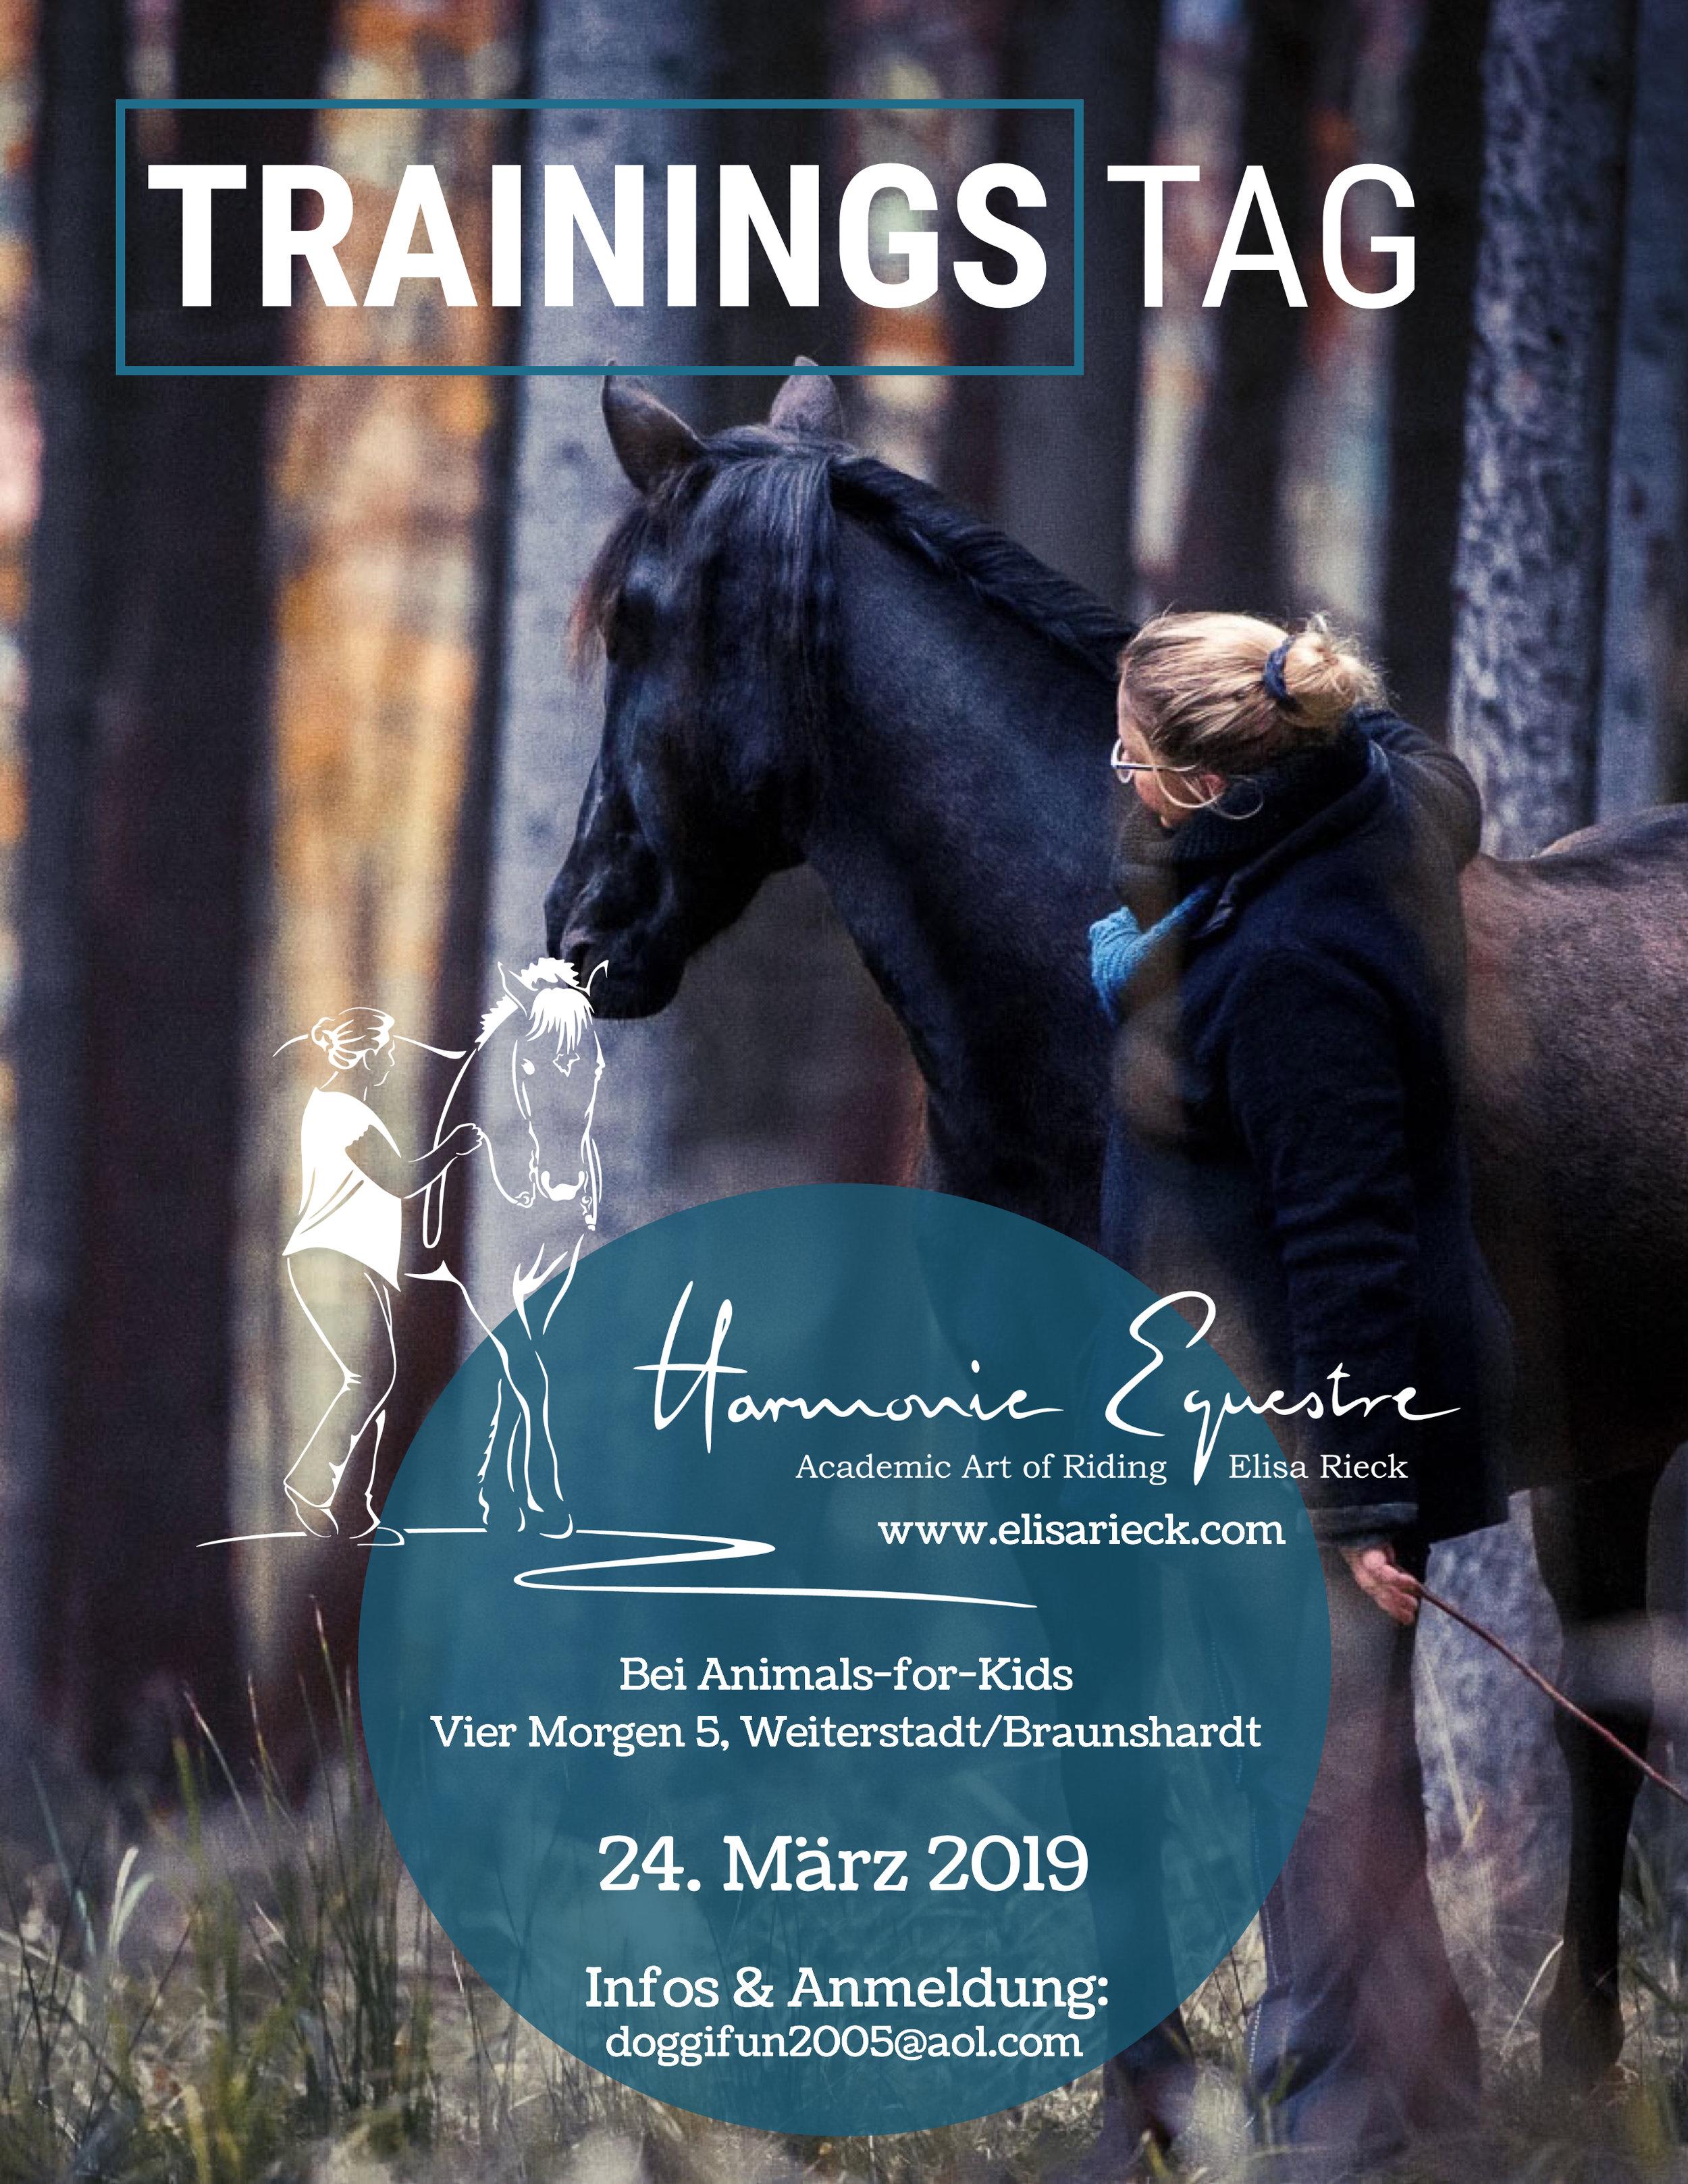 Trainingstag_Animals-for-Kids_24.03.2019.jpg